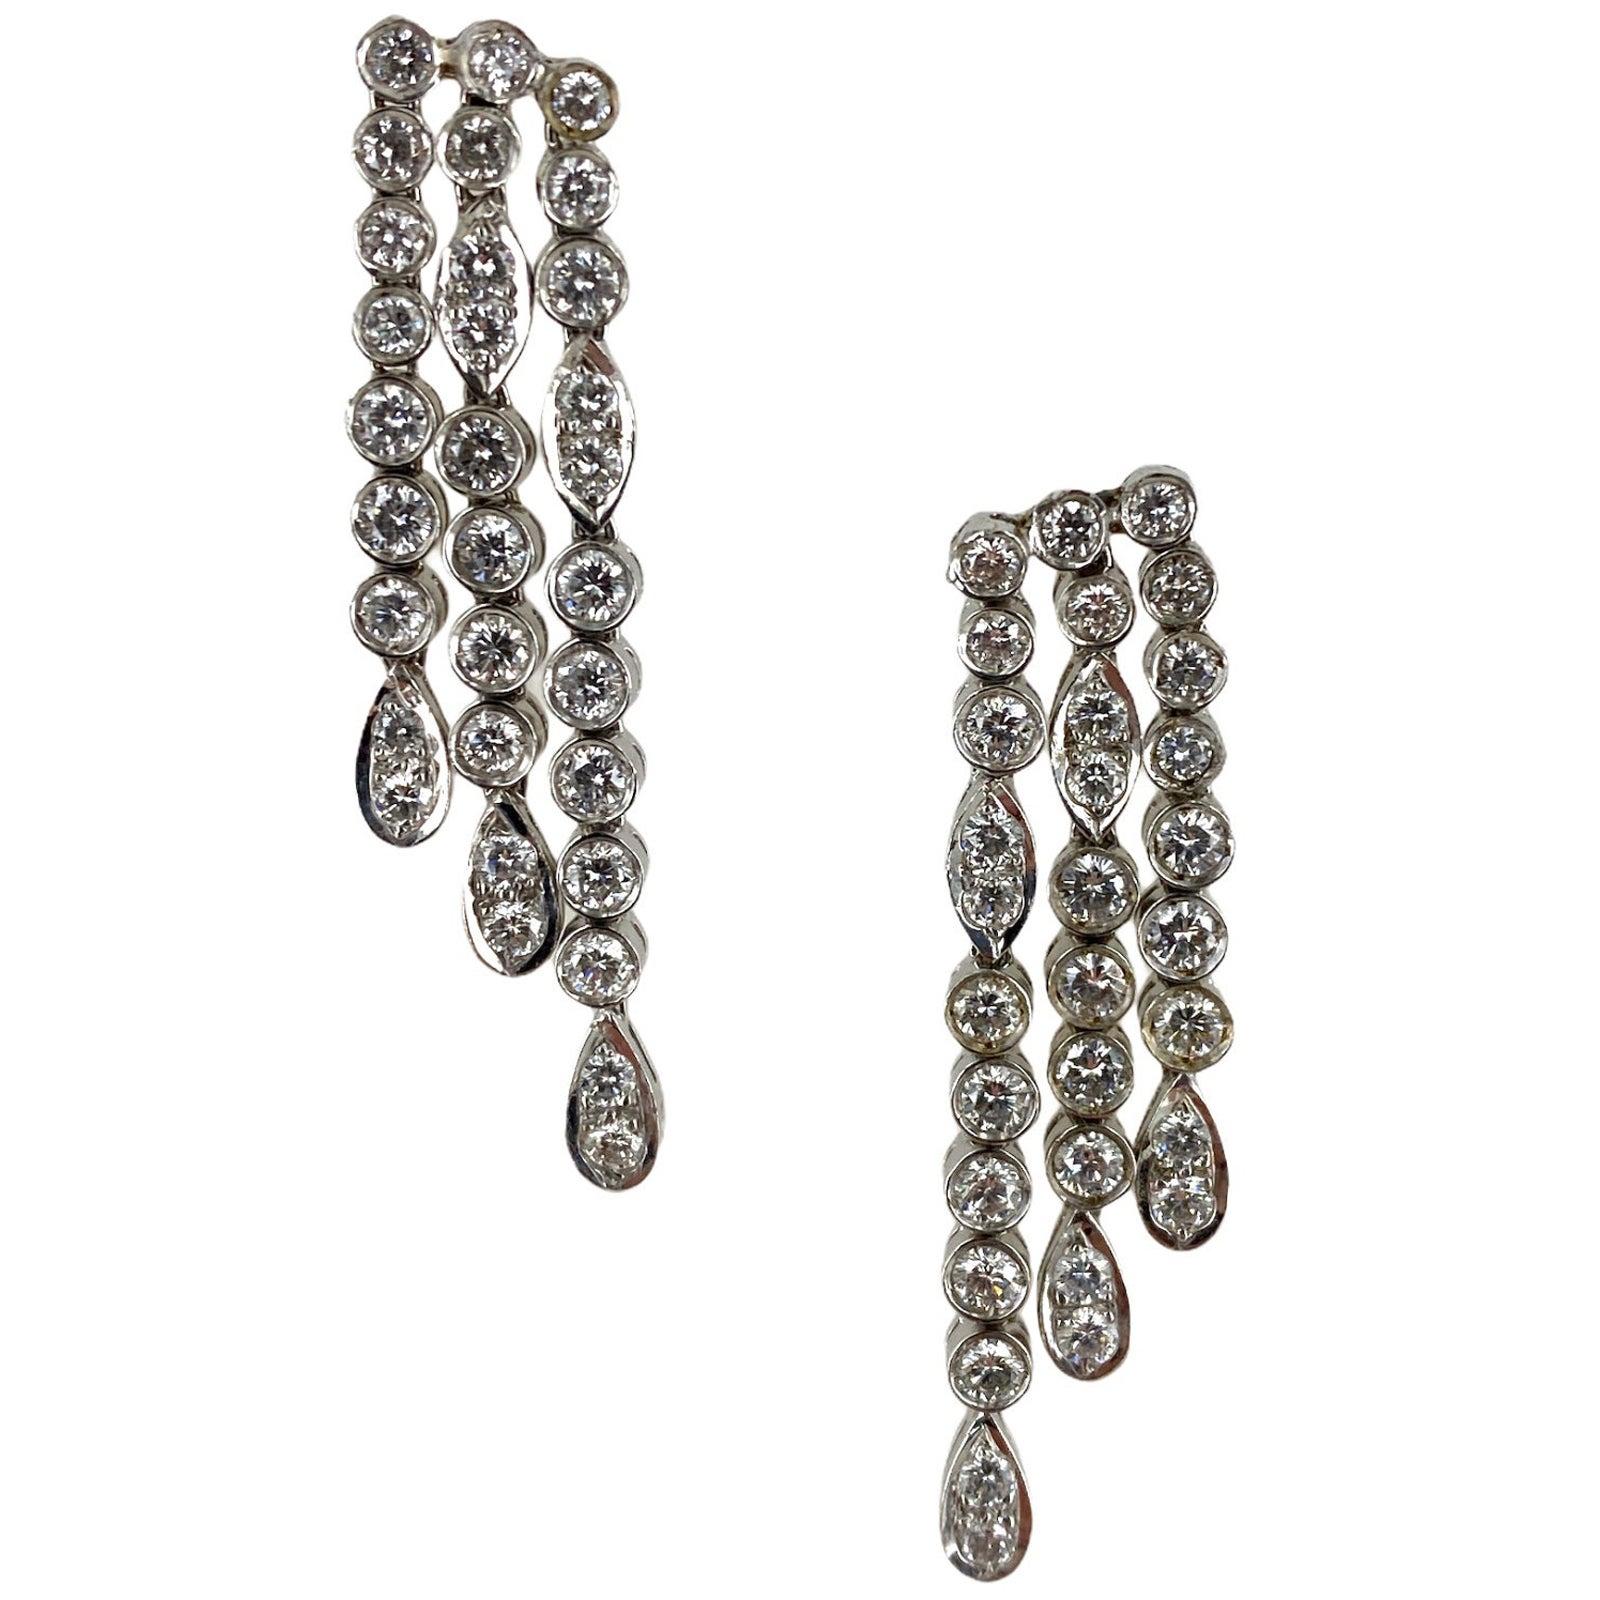 2.00 Carat Round Brilliant Cut Diamond Dangle Drop 14 Karat White Gold Earrings